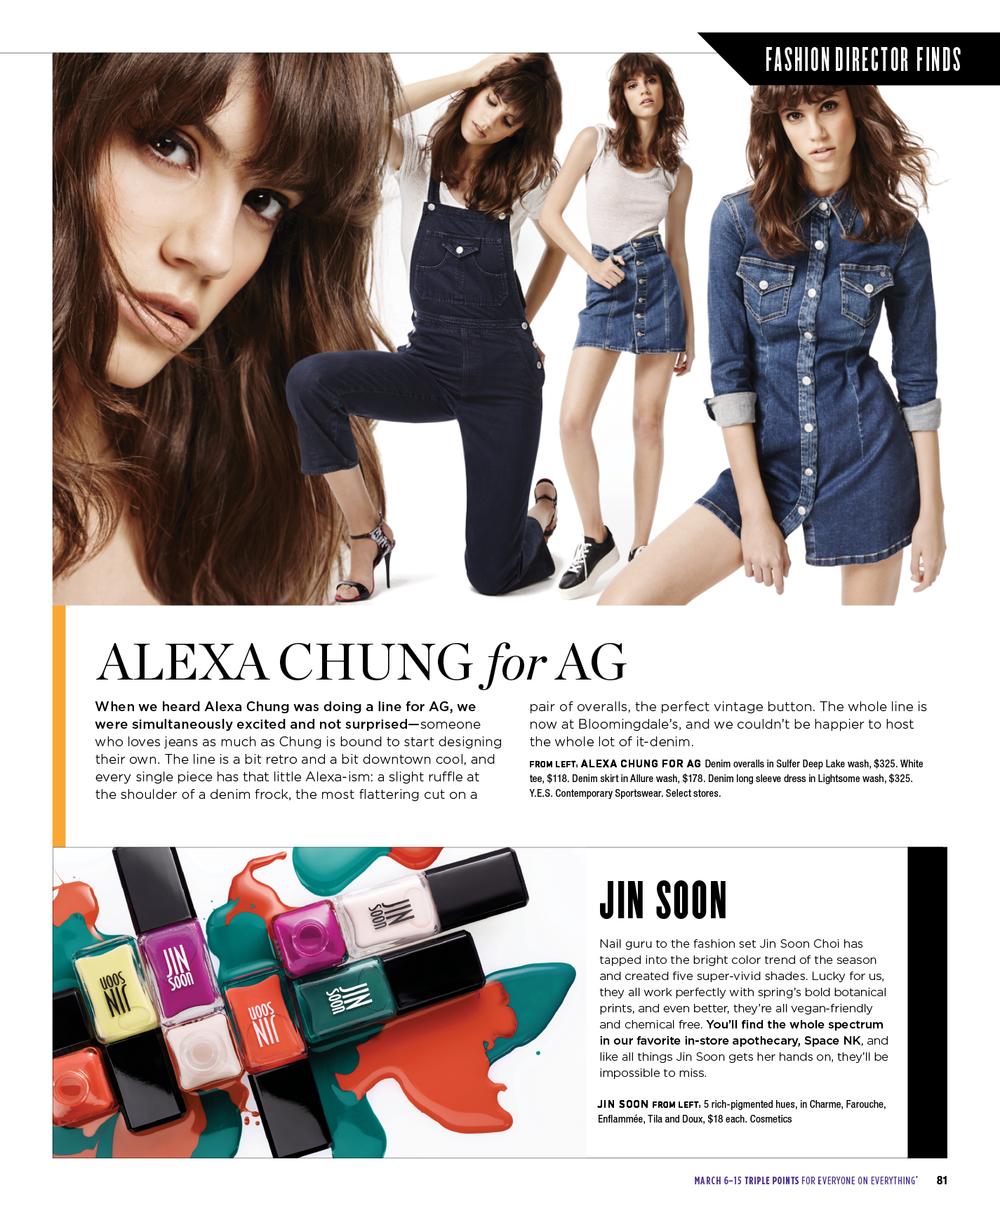 ALEXA CHUNG.png